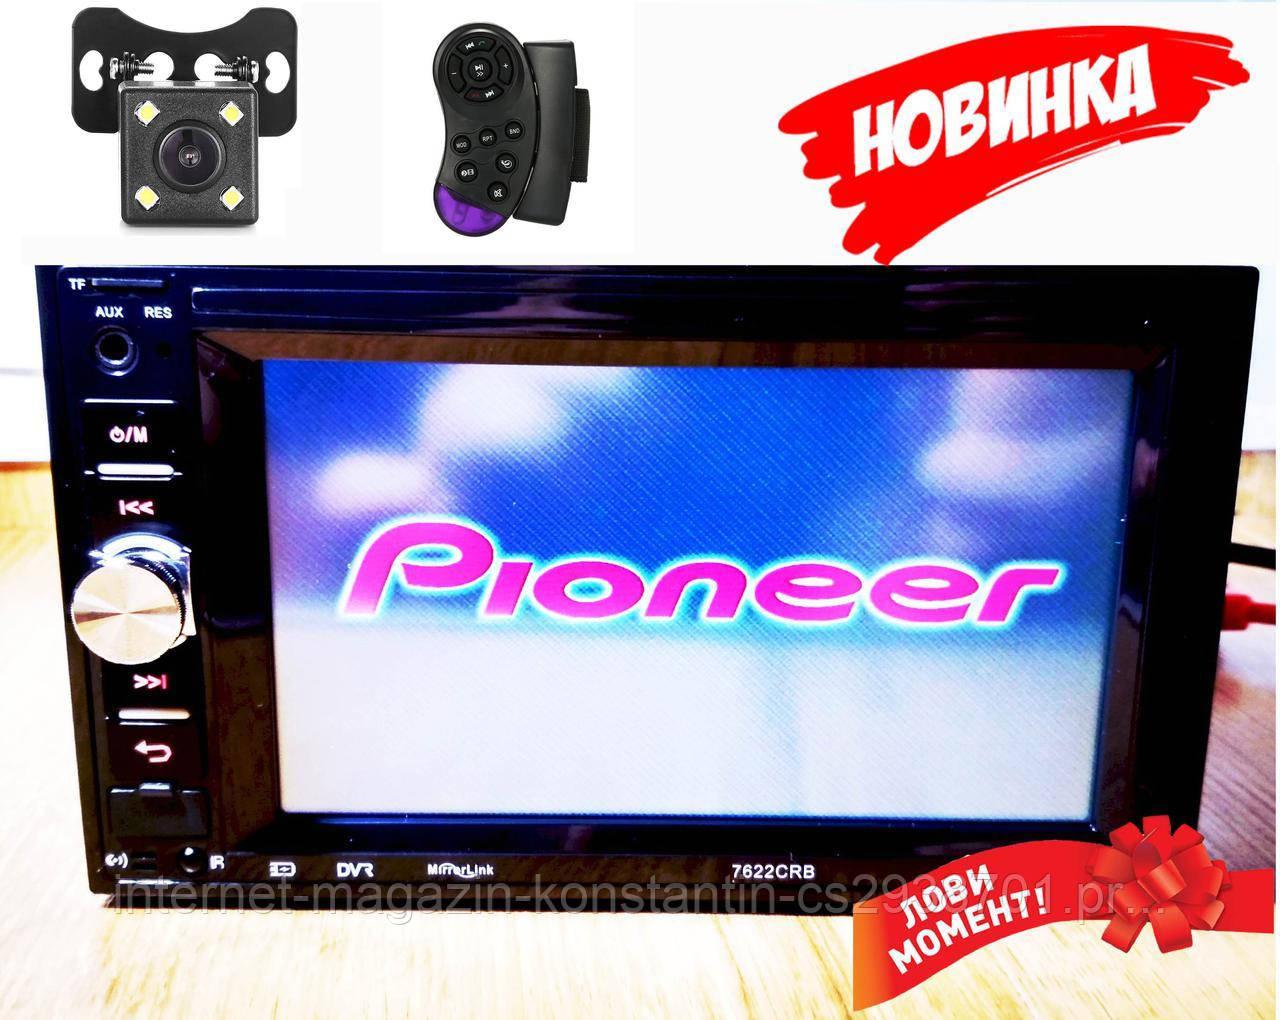 Автомагнитола 2Din Pioneer 7622CRB 1026*600px, USB,SD, Video + ПУЛЬТ НА РУЛЬ+КАМЕРА